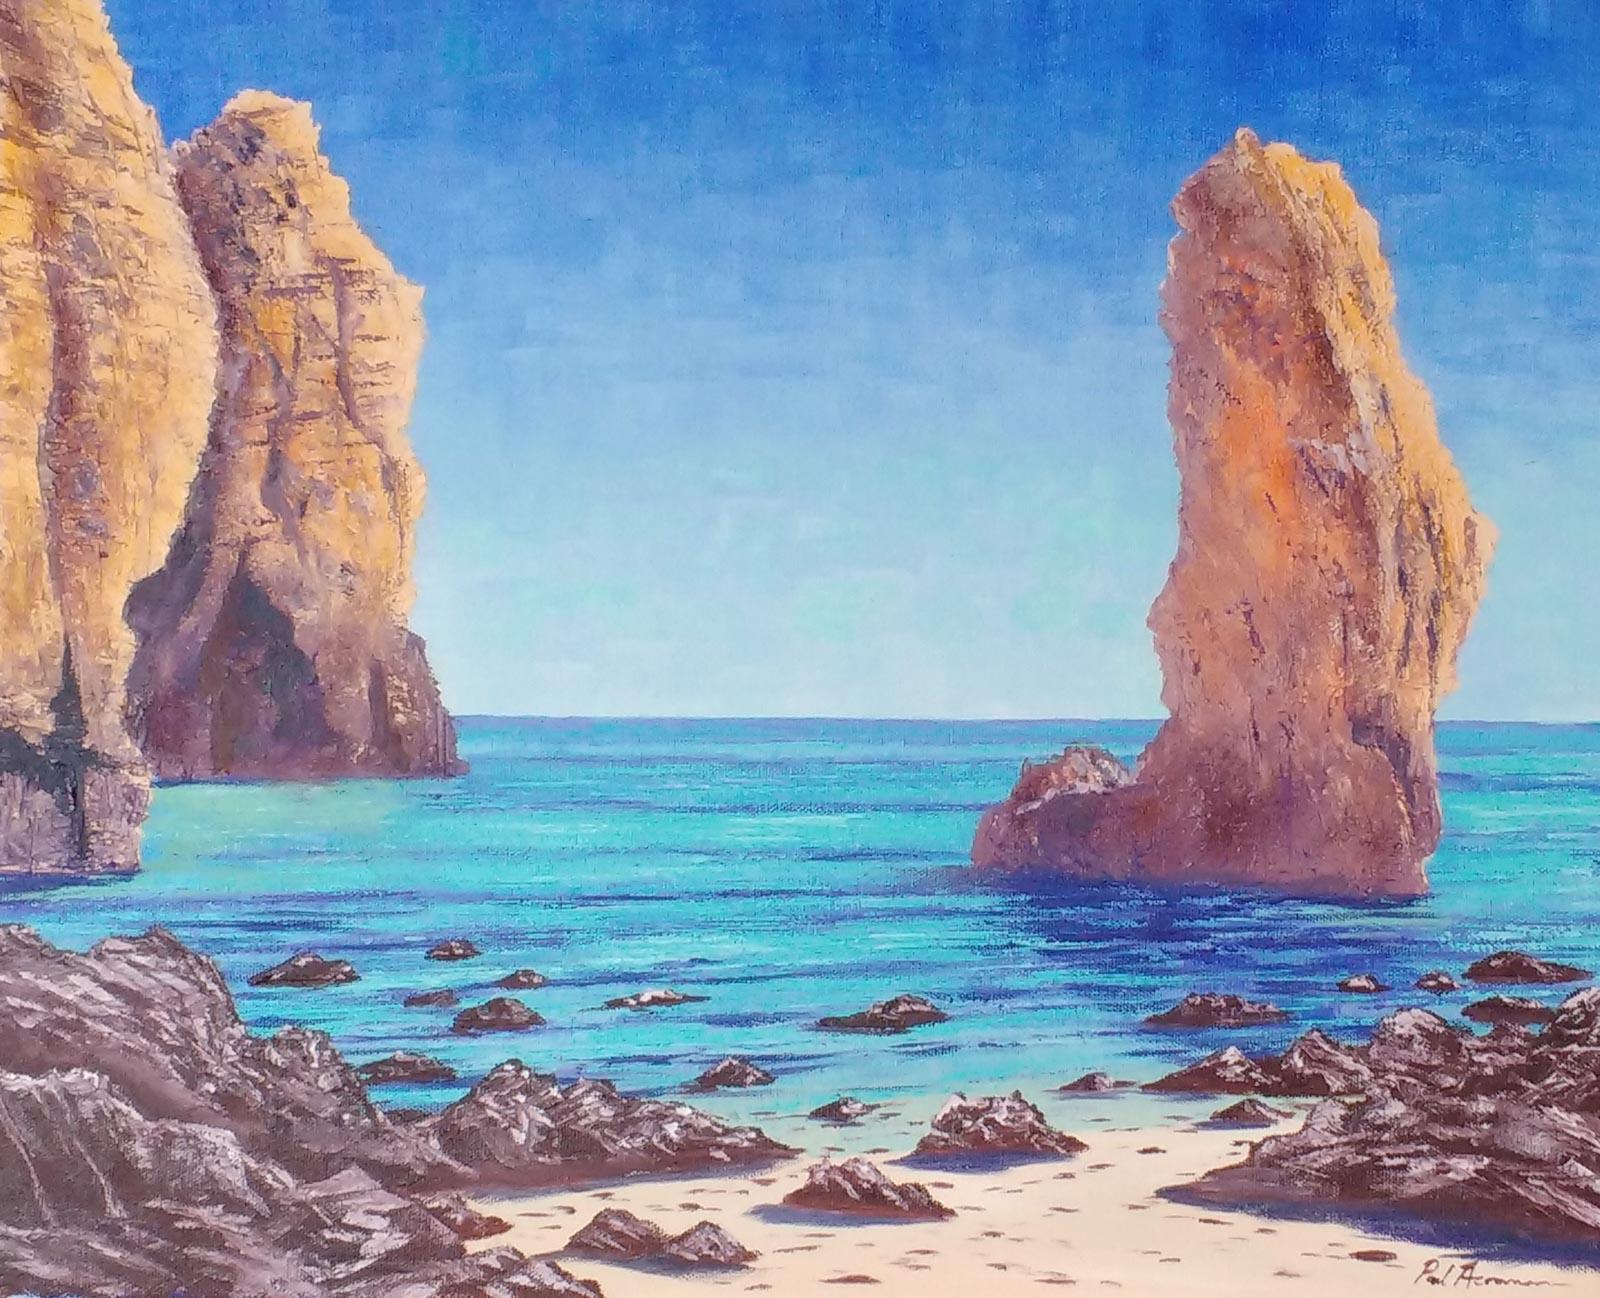 Paul Acraman-seascape-painting-Algarve-Ponta da Piedade,Lagos